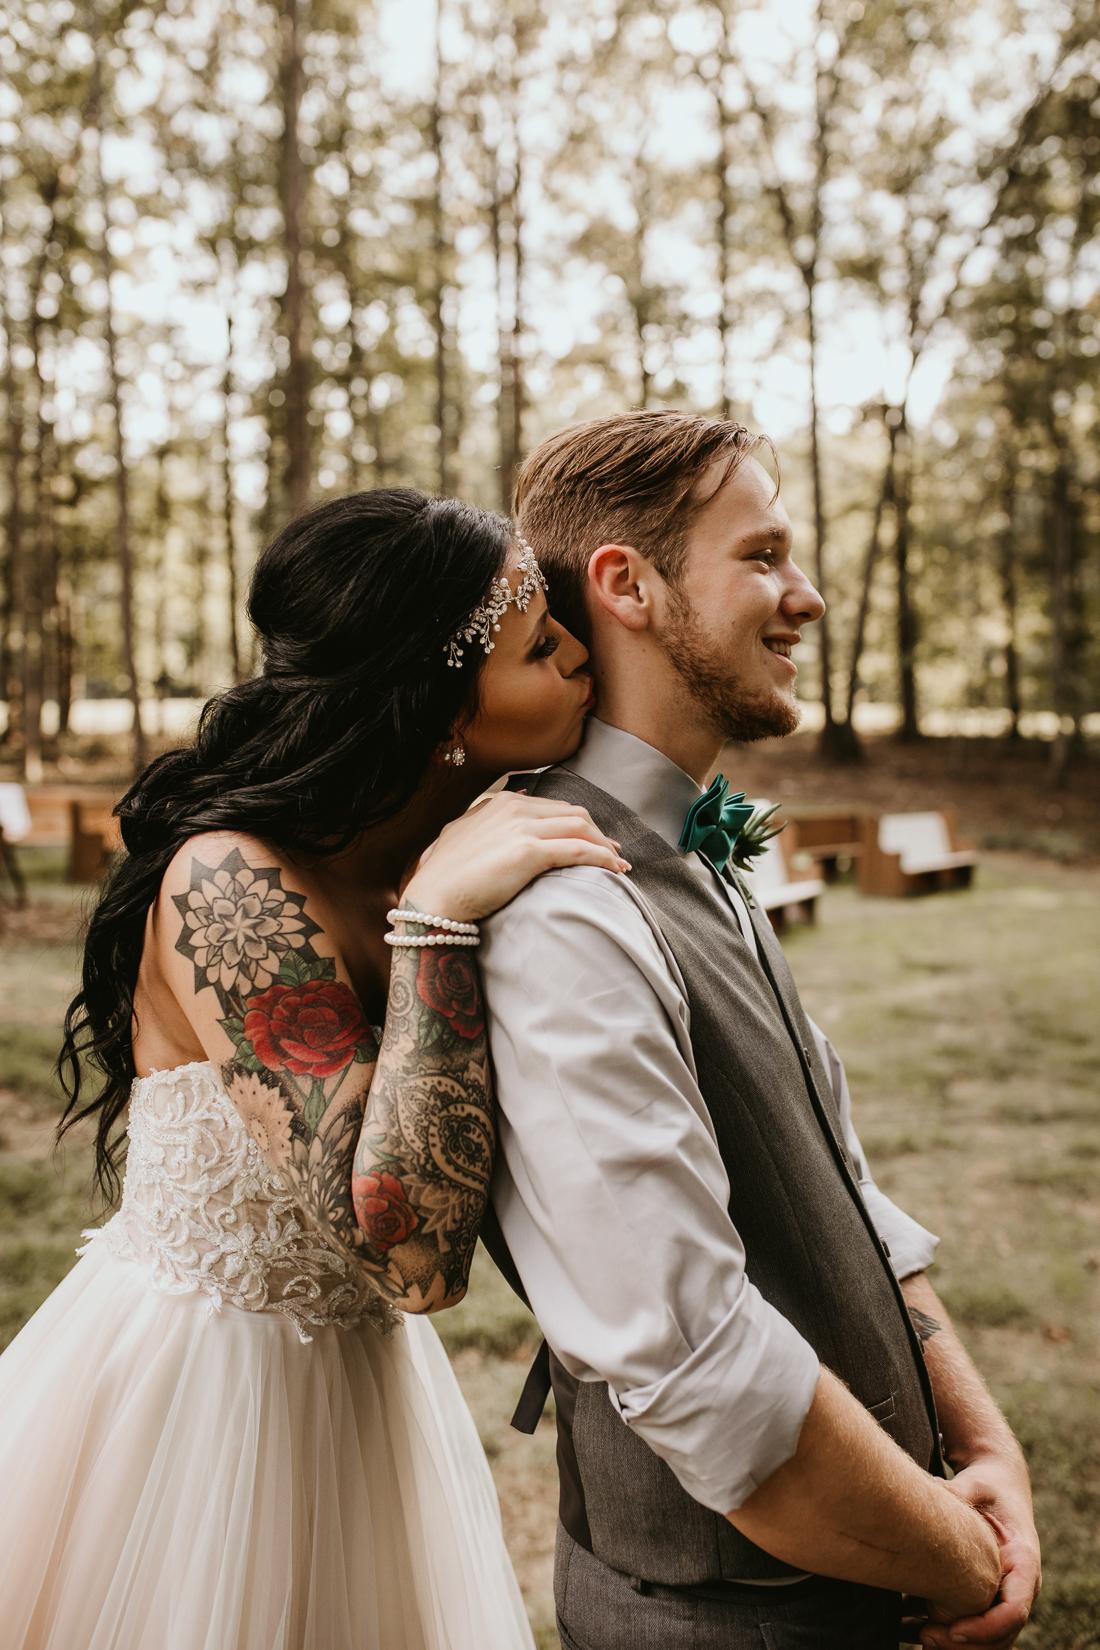 olivia_zay_wedding_09_2018-8746.jpg